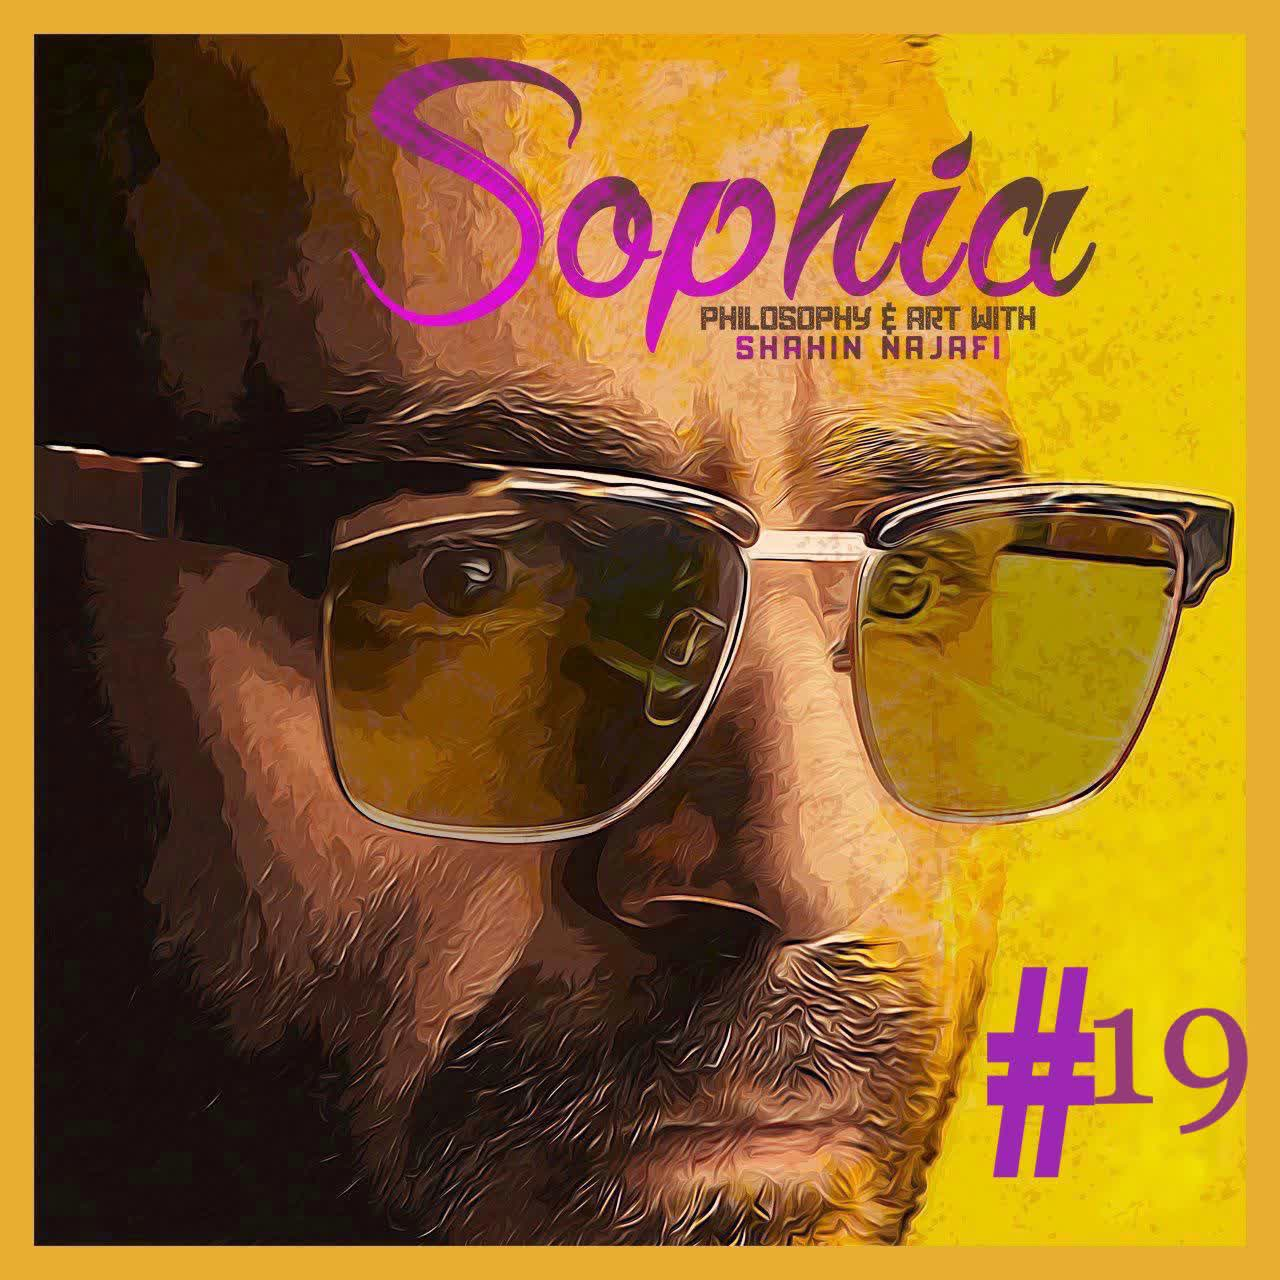 Sophia #19 Plato 3- Shahin Najafi & Veria Amiri سوفیا ۱۹ - افلاطون ۳ - شاهین نجفی و وریا امیری